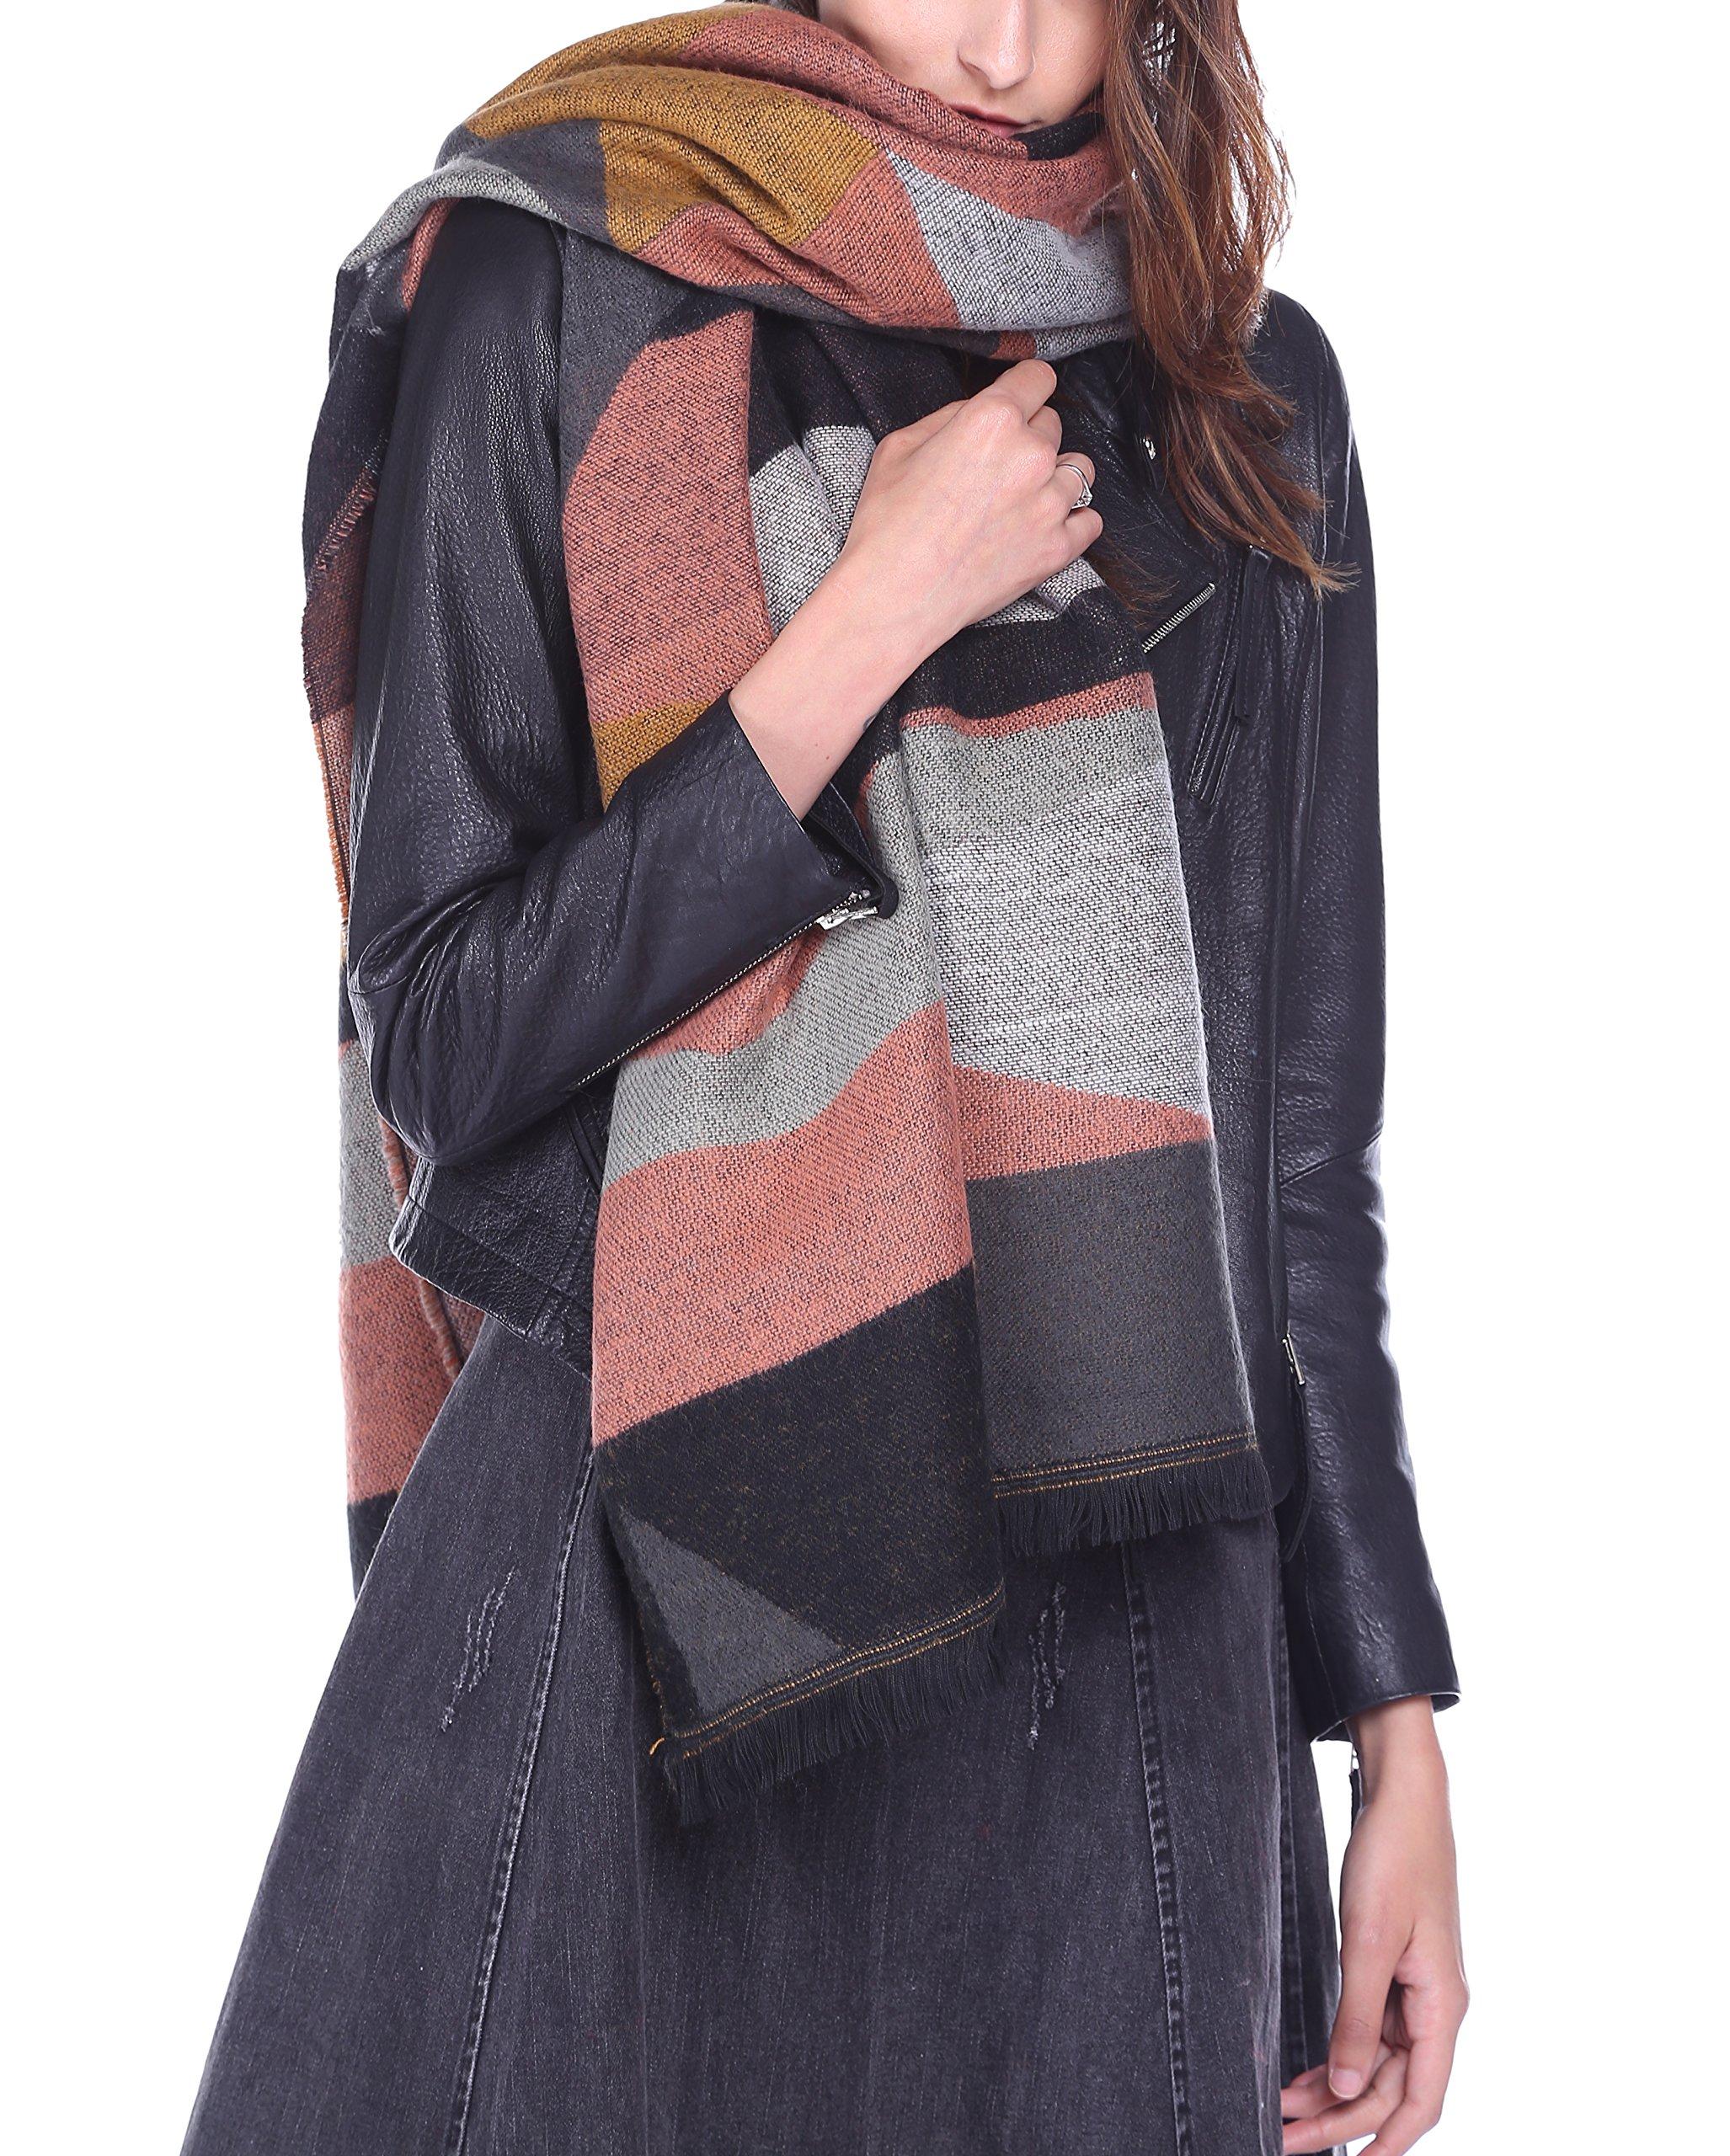 Afibi Women's Long Color Block Blanket Shawl Fashion Winter Warm Large Scarf (Orange)